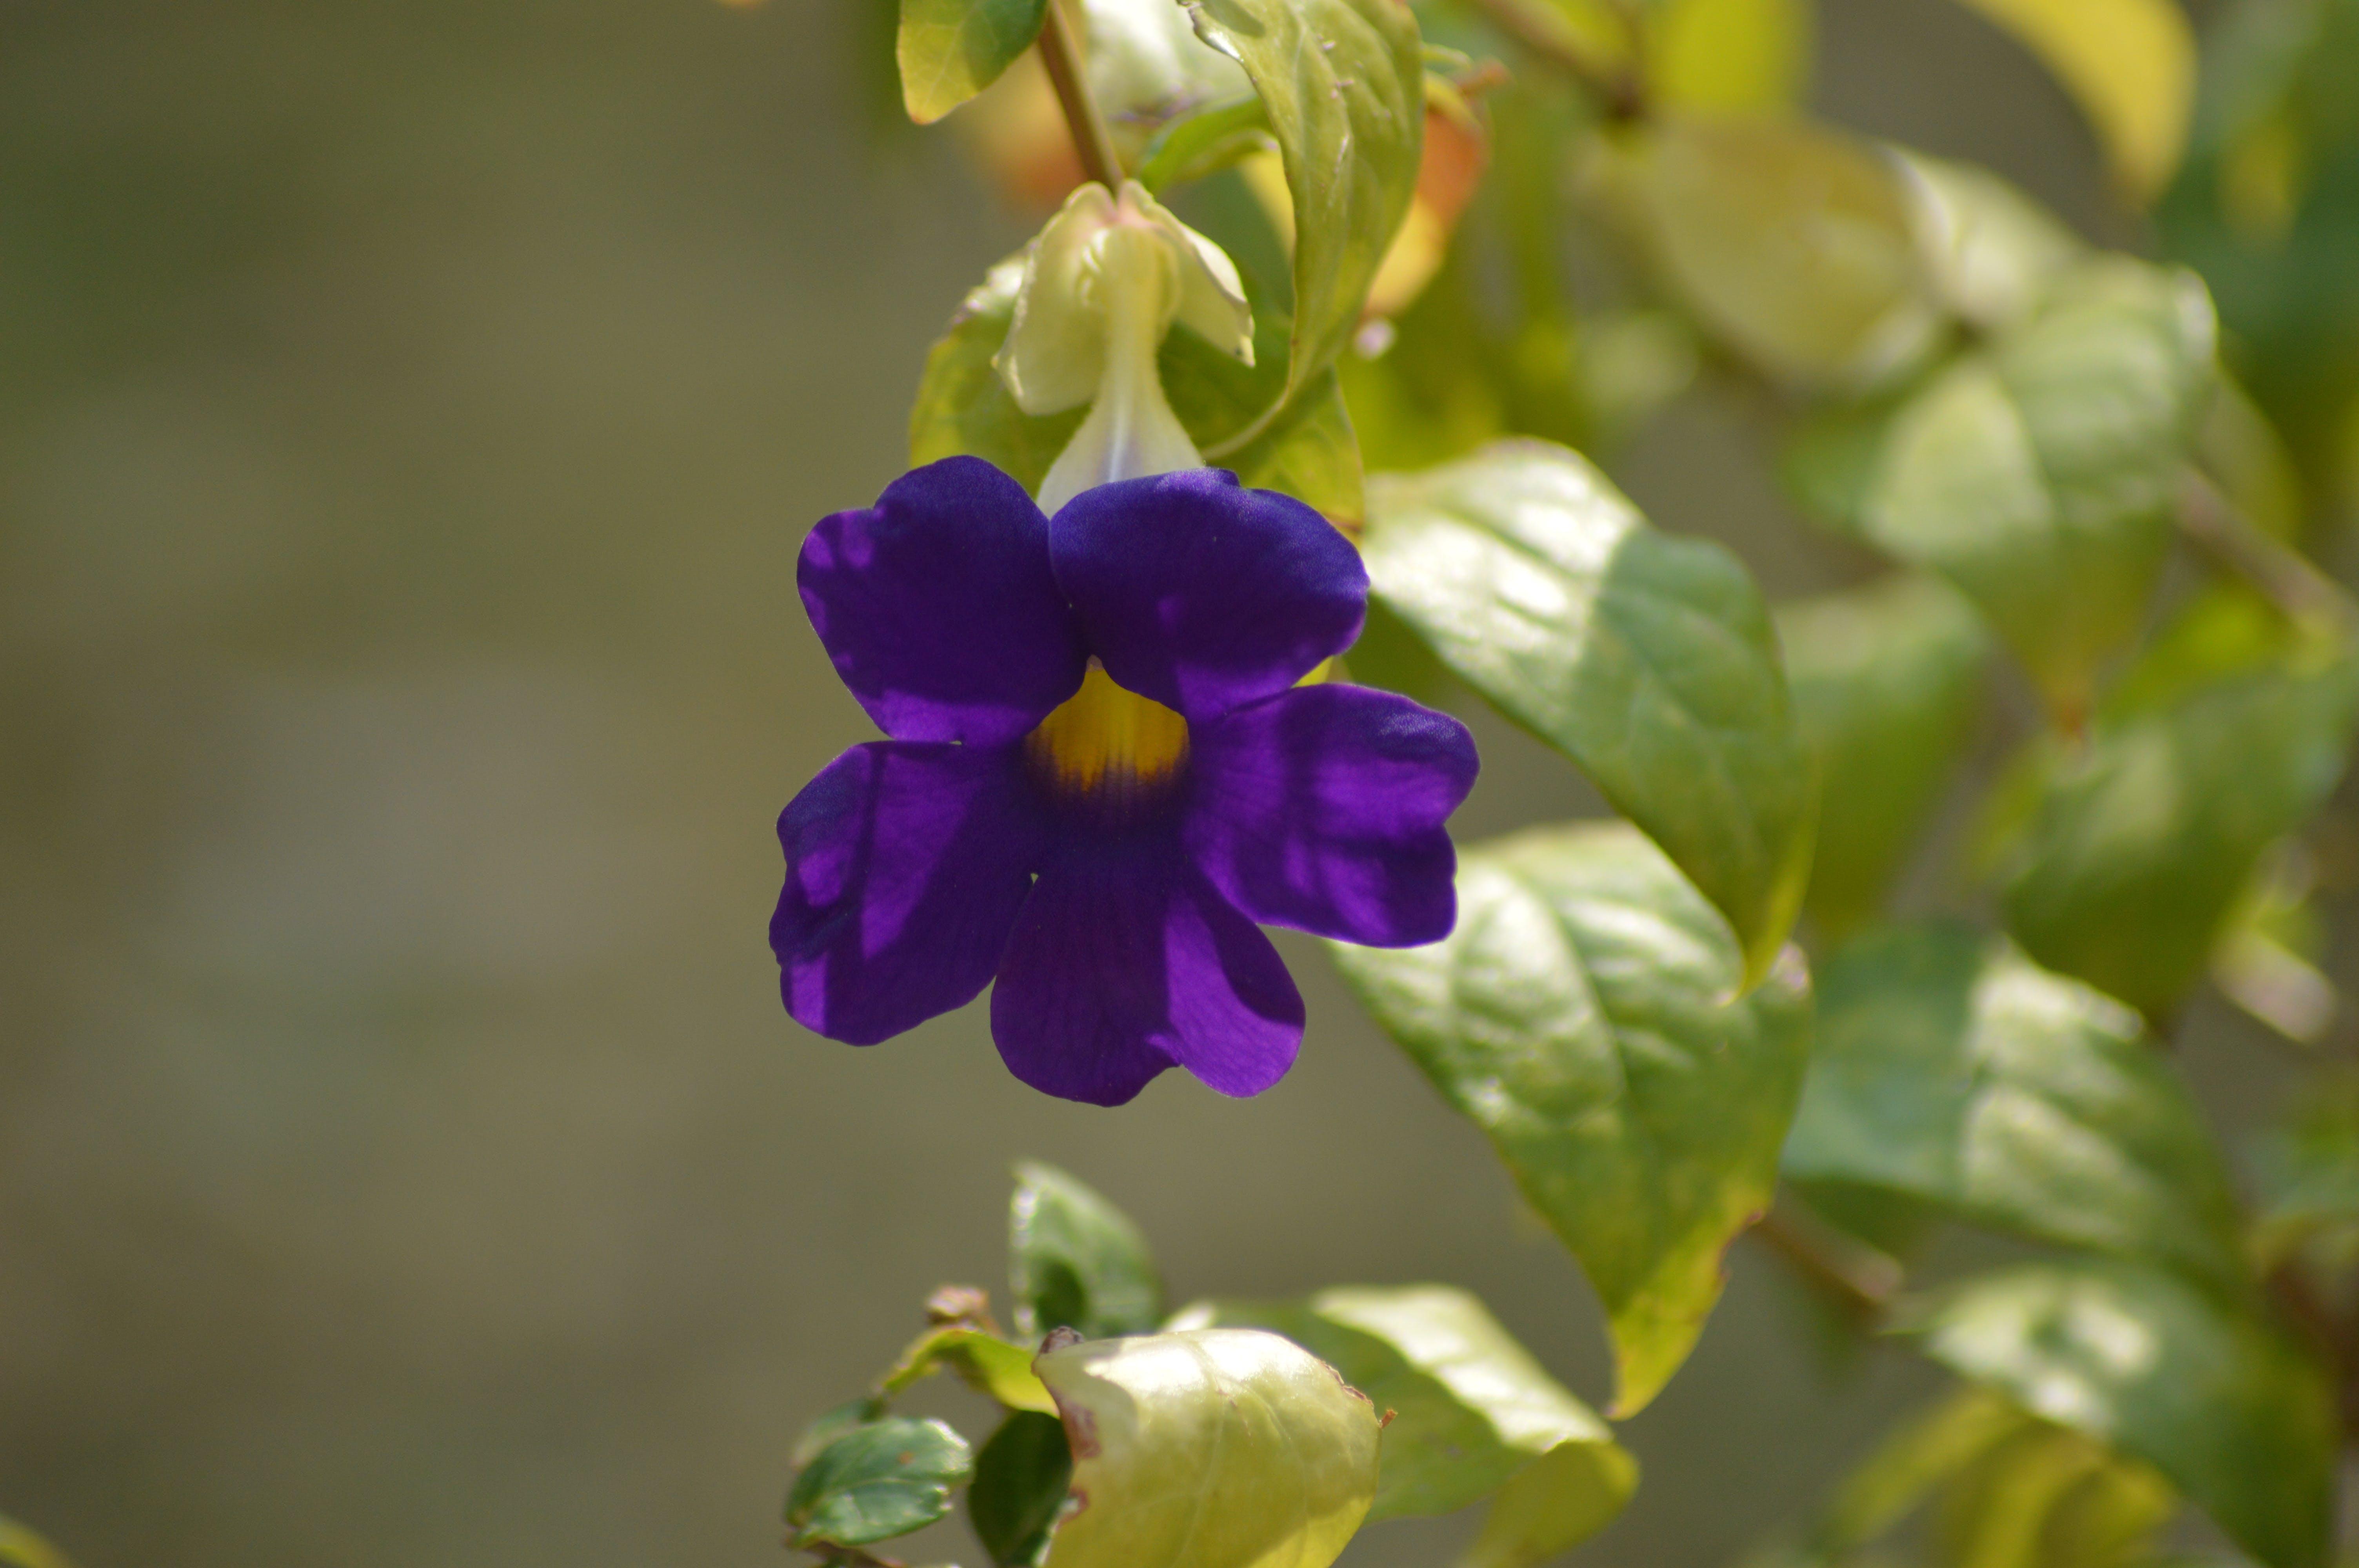 Free stock photo of flower, blue flowers, green flower